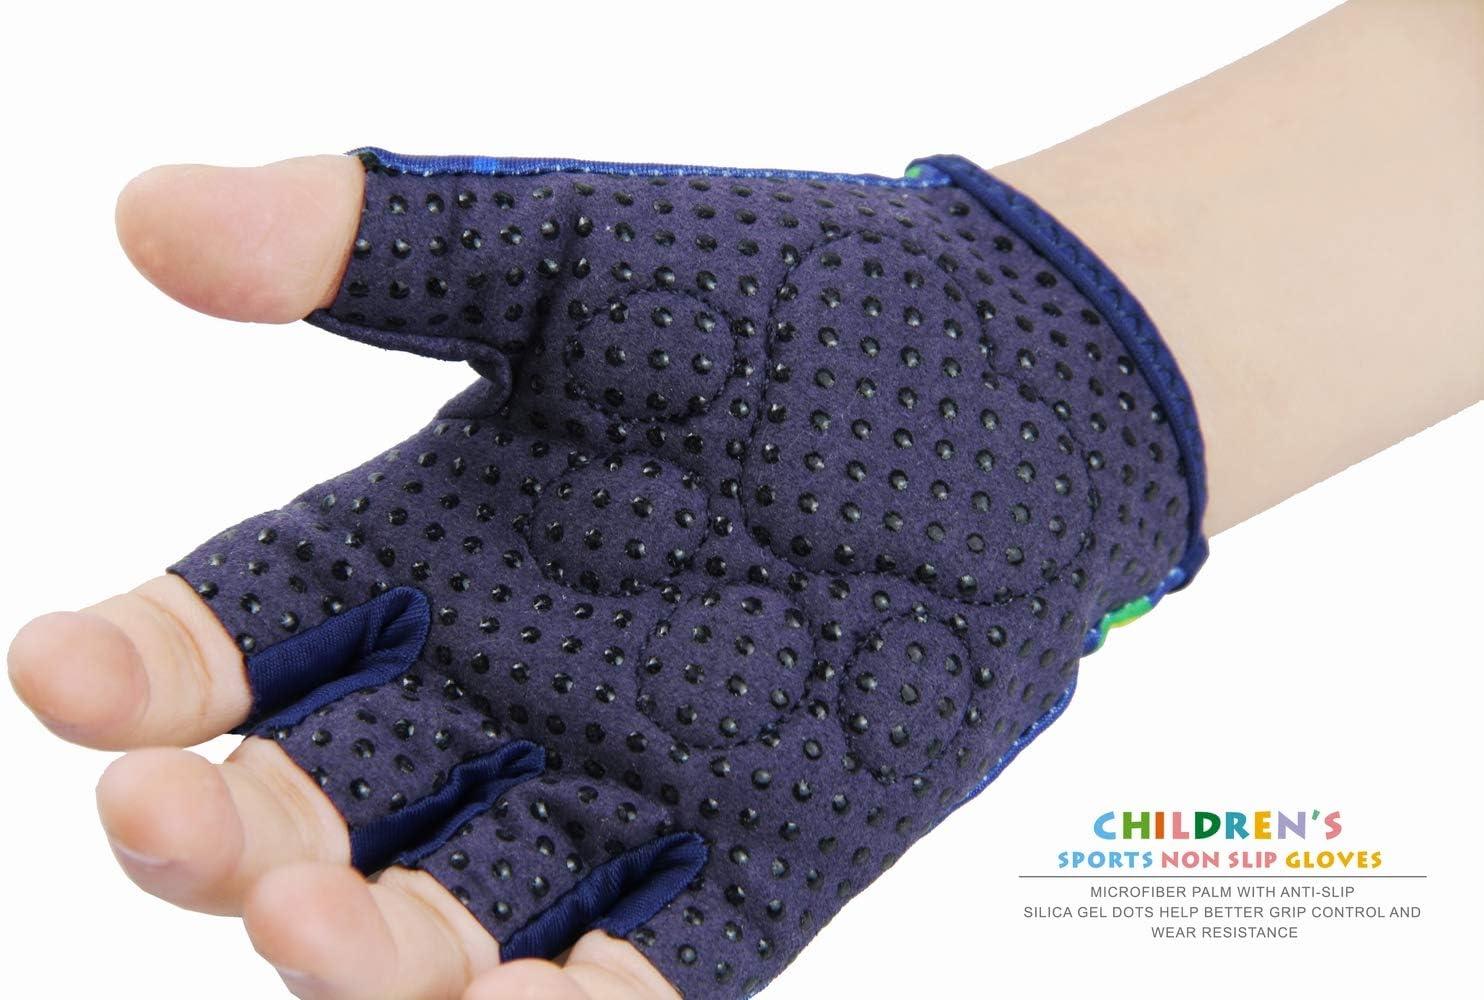 Kids Half-Finger Monkey Bar Gloves for Age 1-9 Boys Girls Climbing Biking Good Grip Control Gloves for Gymnastics Balance Boards Outdoor Sports